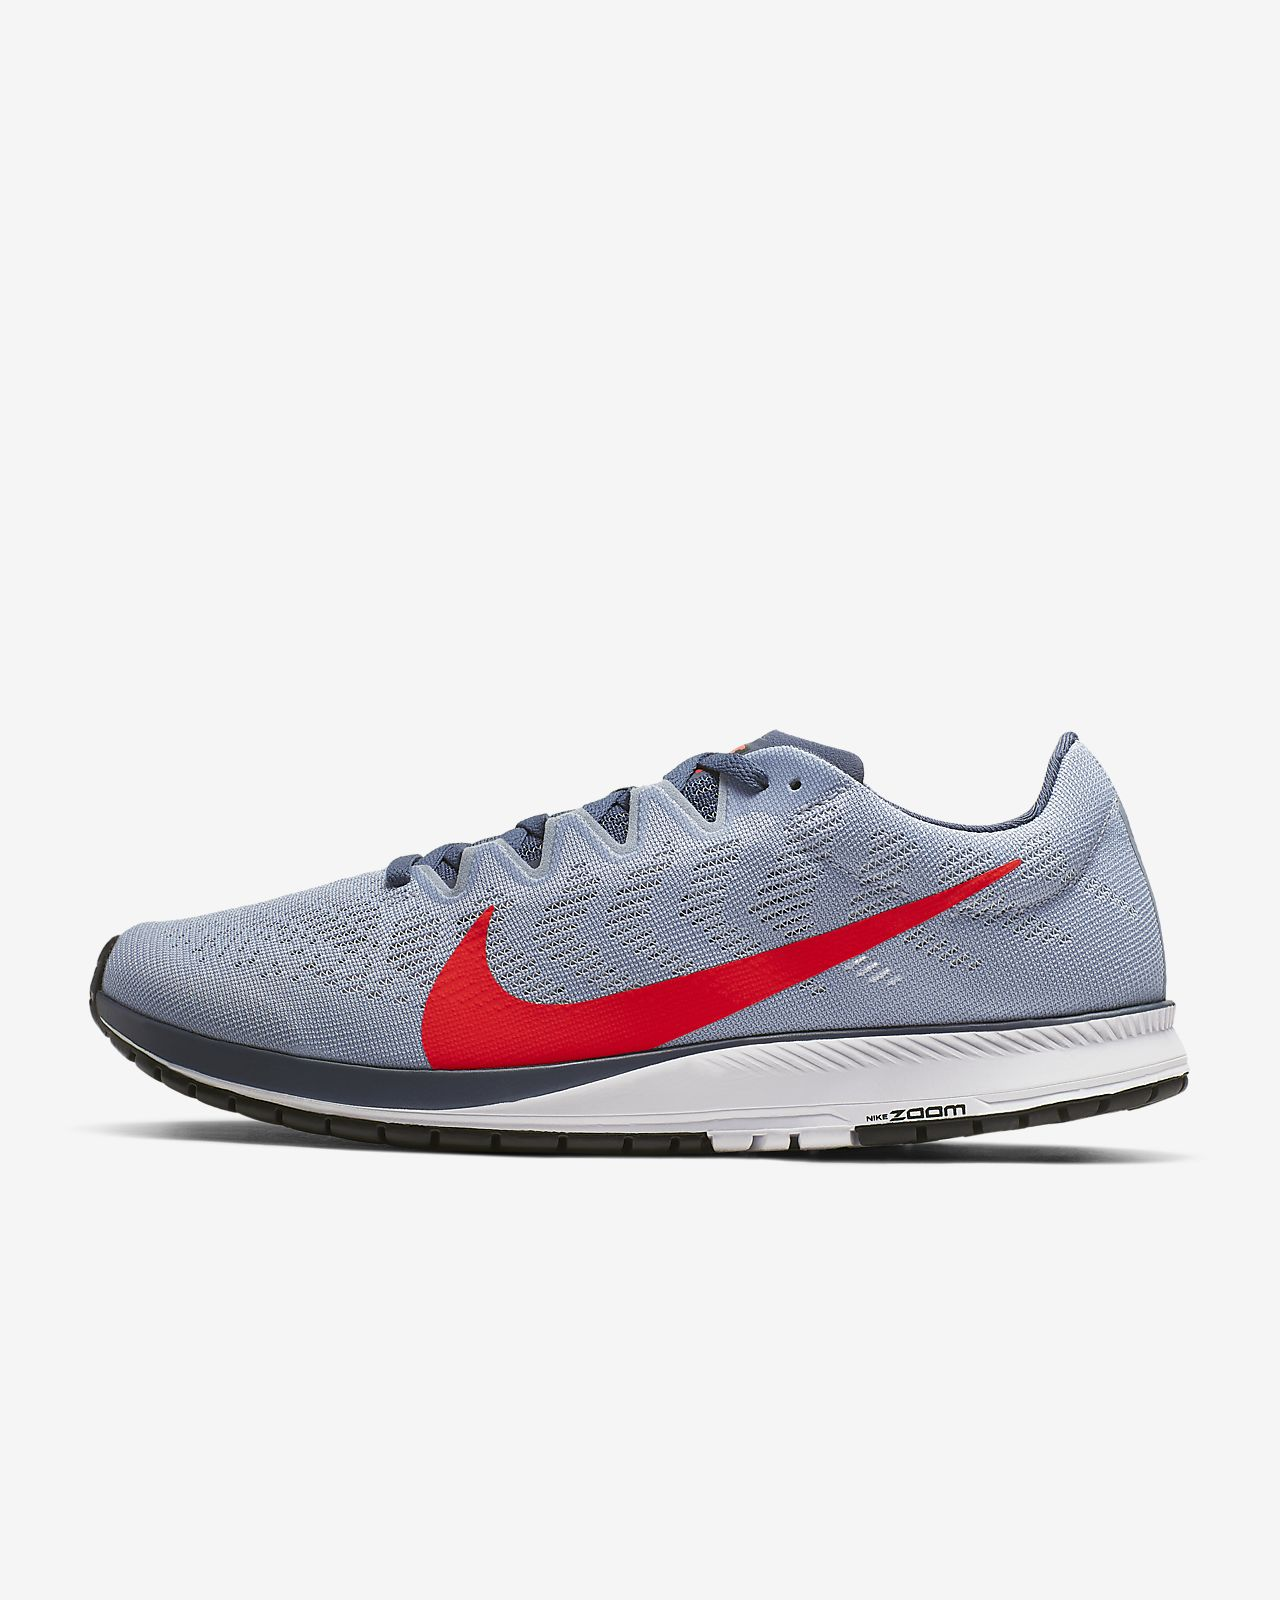 971094a087d Nike Air Zoom Streak 7 Zapatillas de running. Nike.com ES